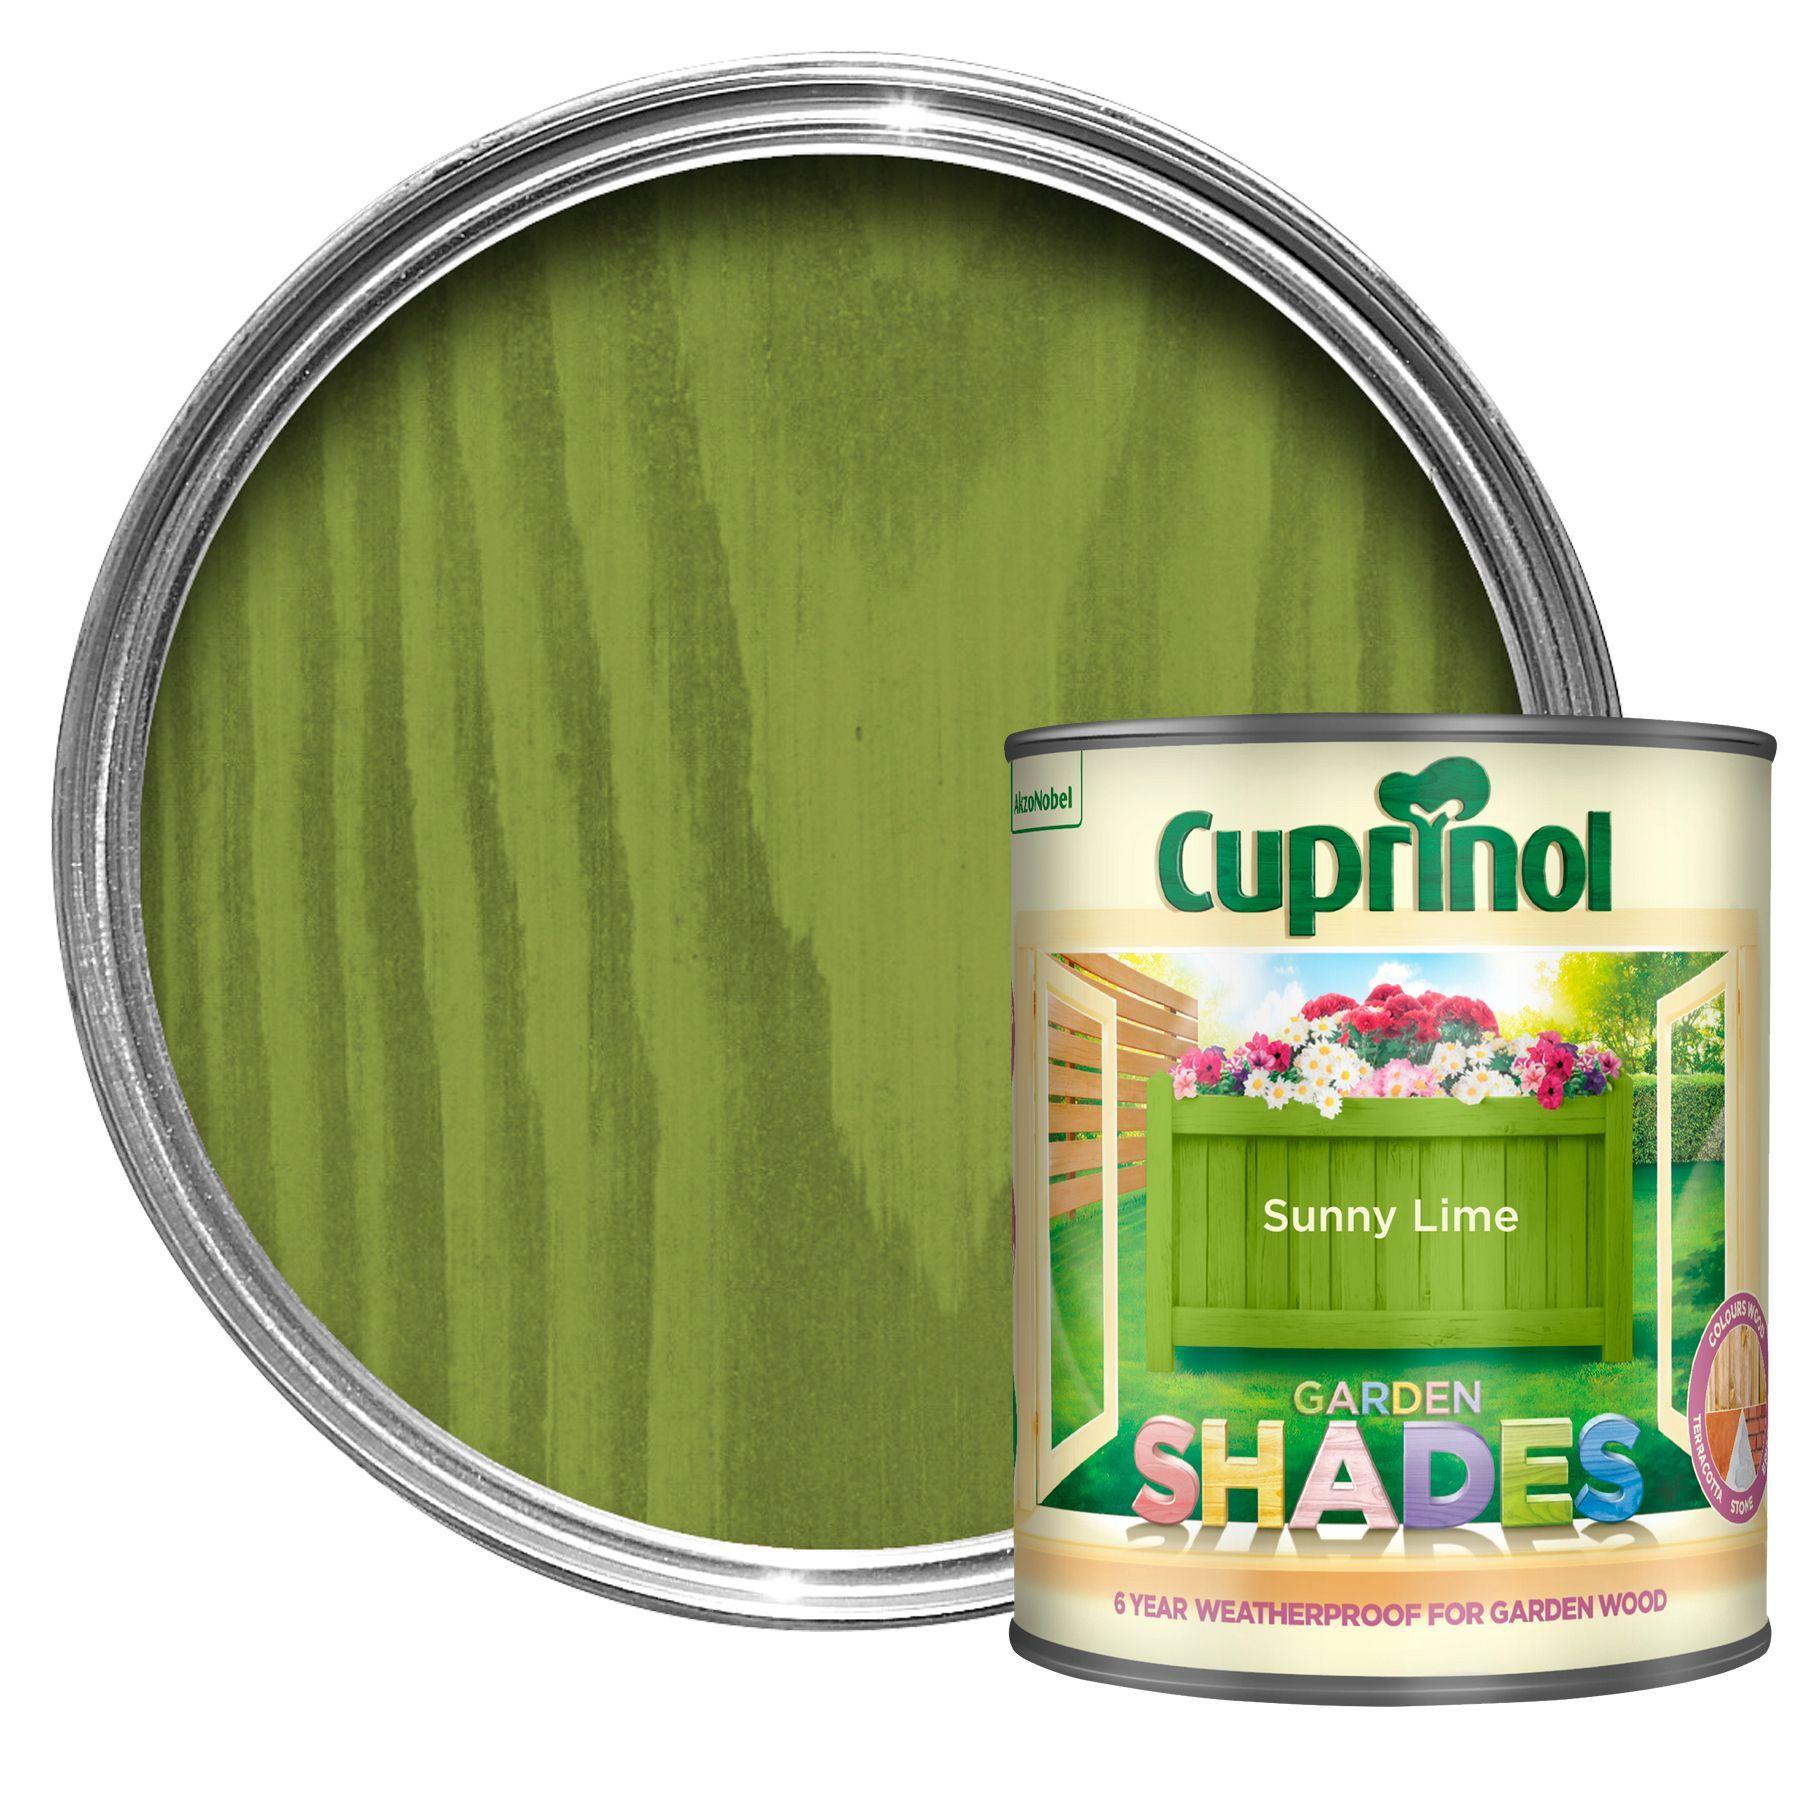 Cuprinol Garden Shades Sunny Lime Matt Wood Paint 1L B&Q